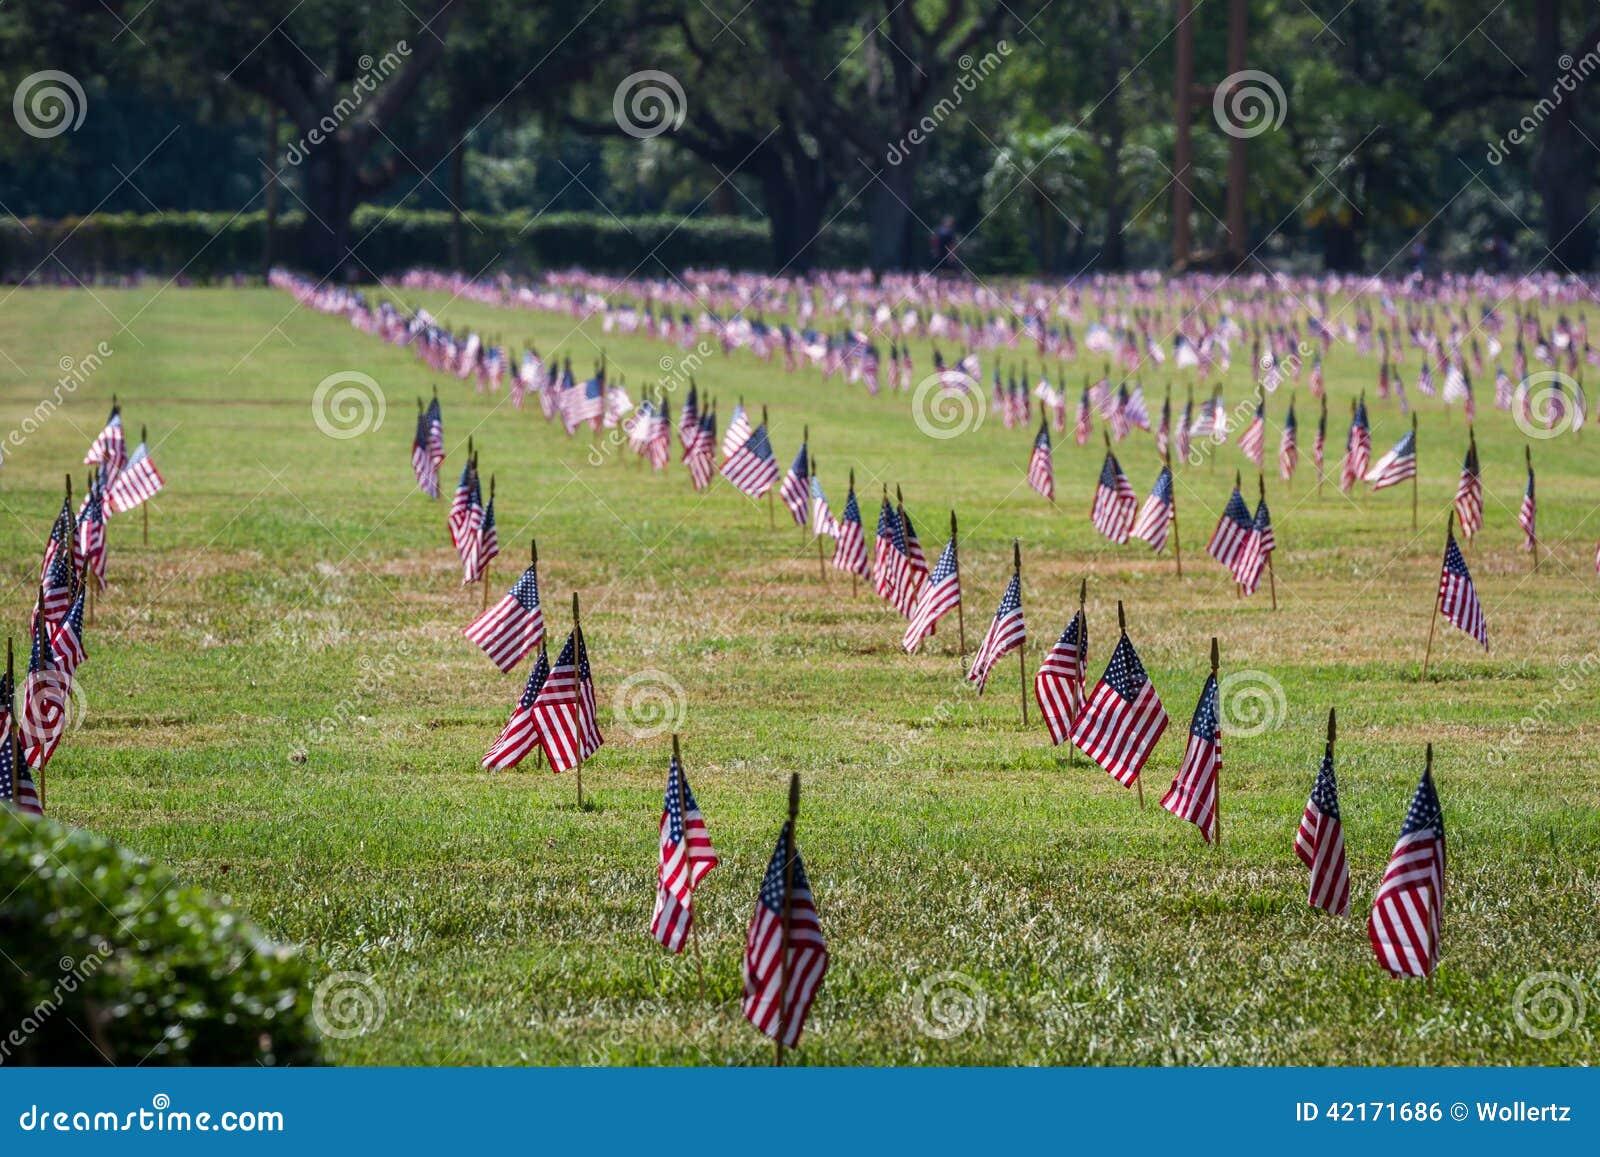 Oss flaggor i en veterankyrkogård på veterandag